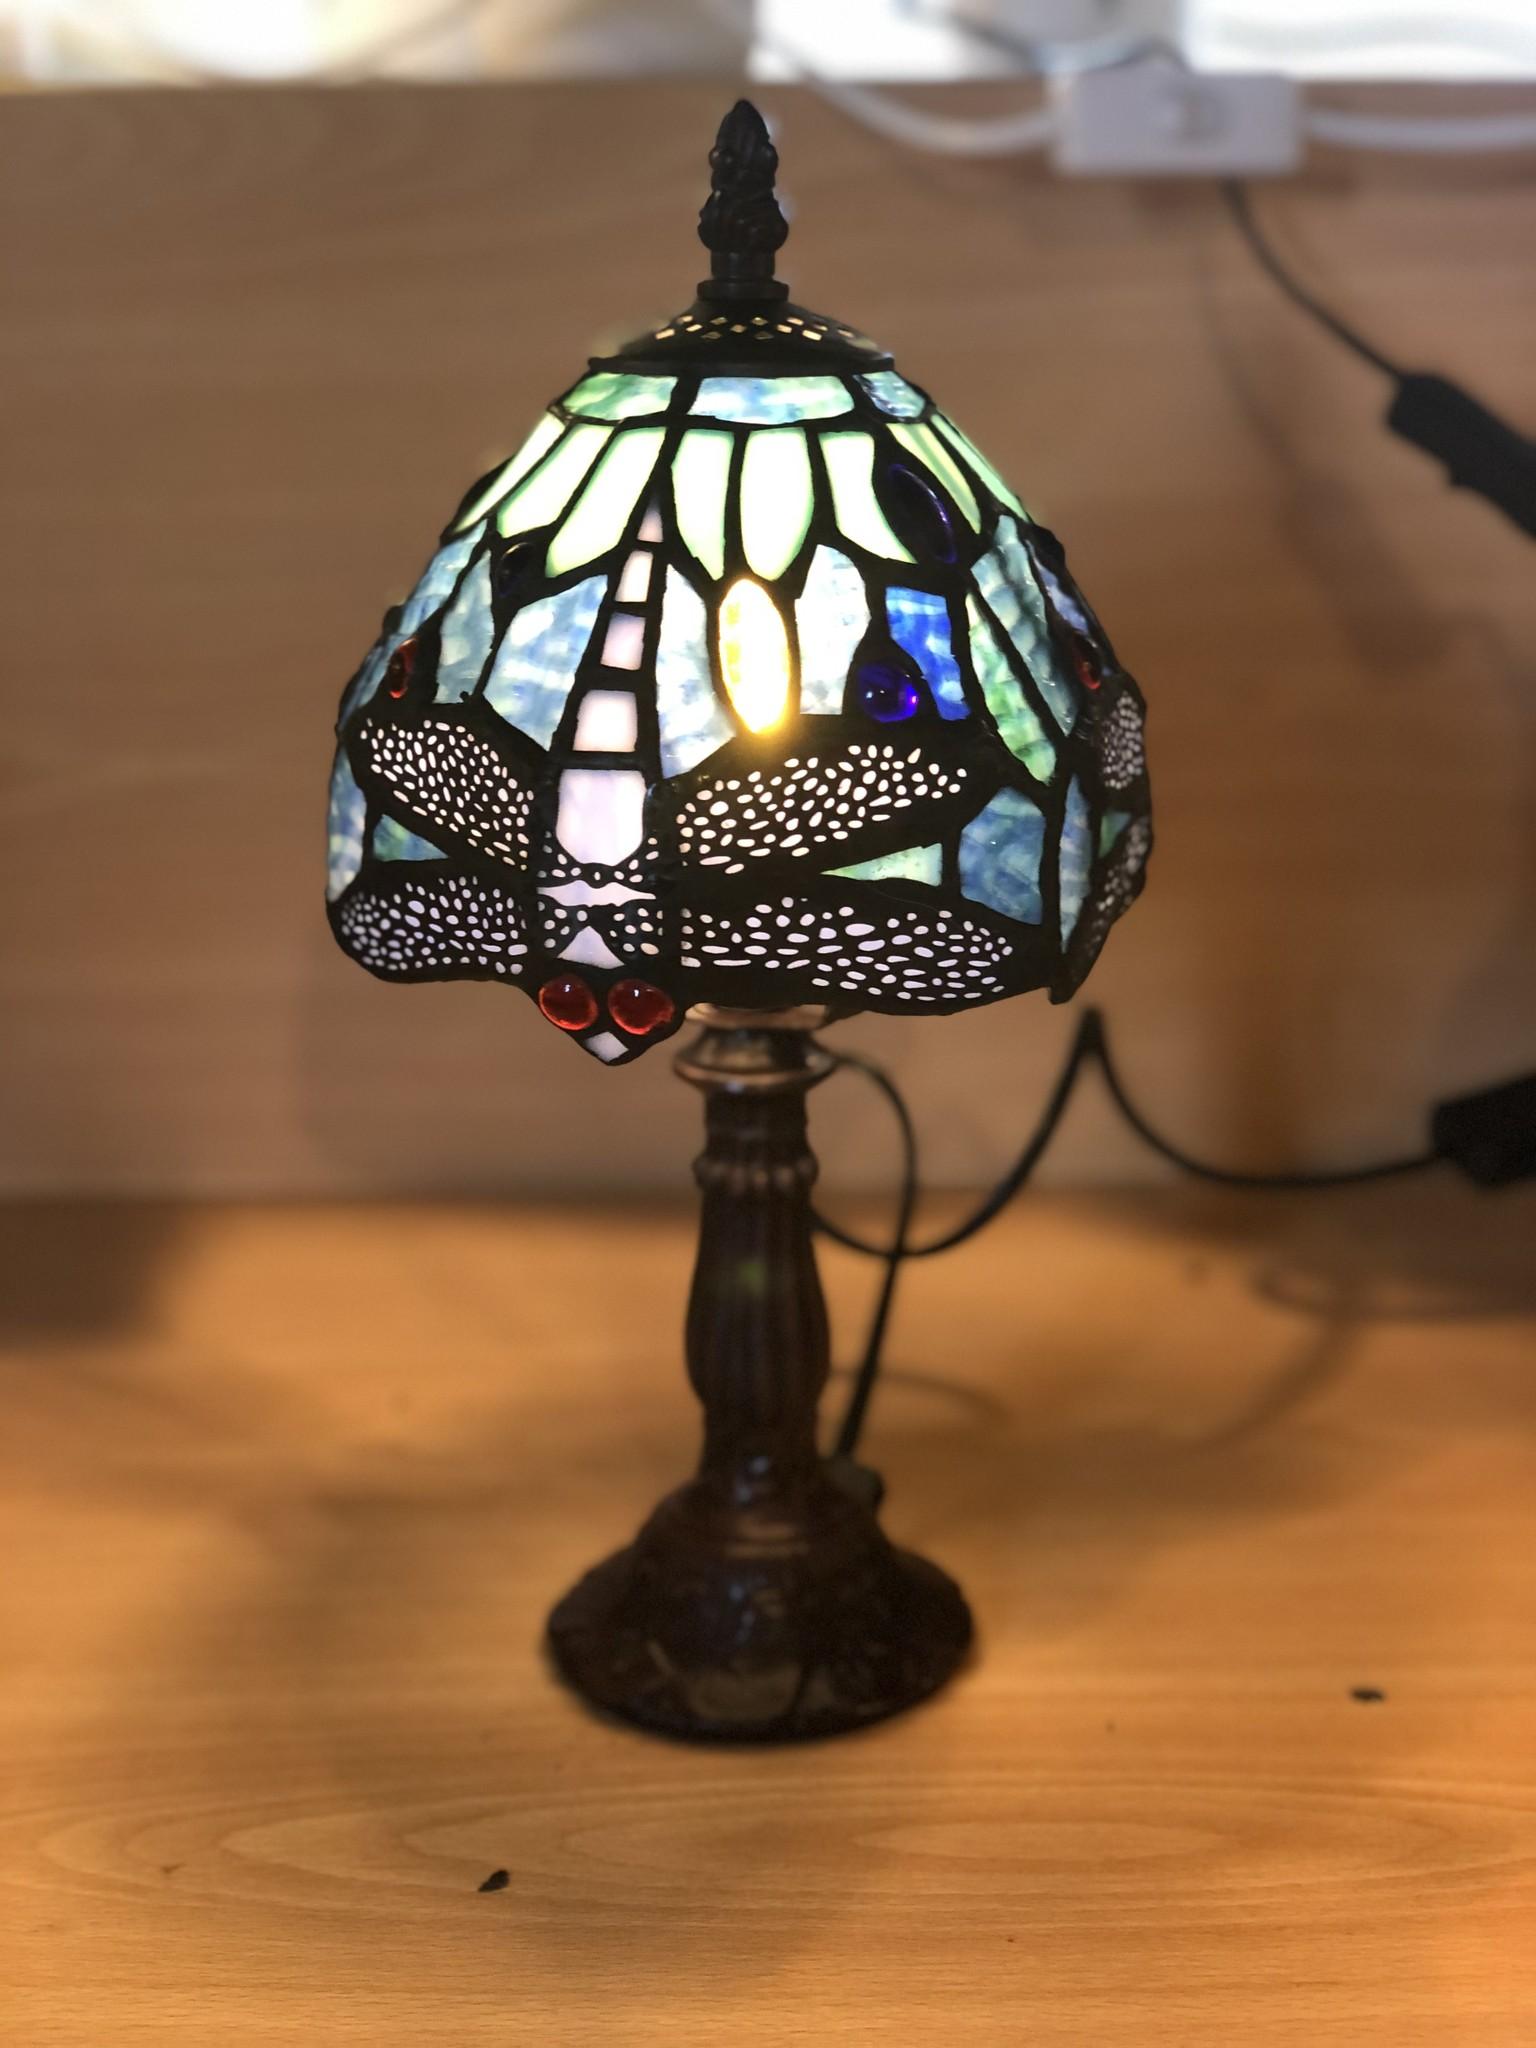 RoMaLux 7222 Tiffany Tafellampje met Libelles